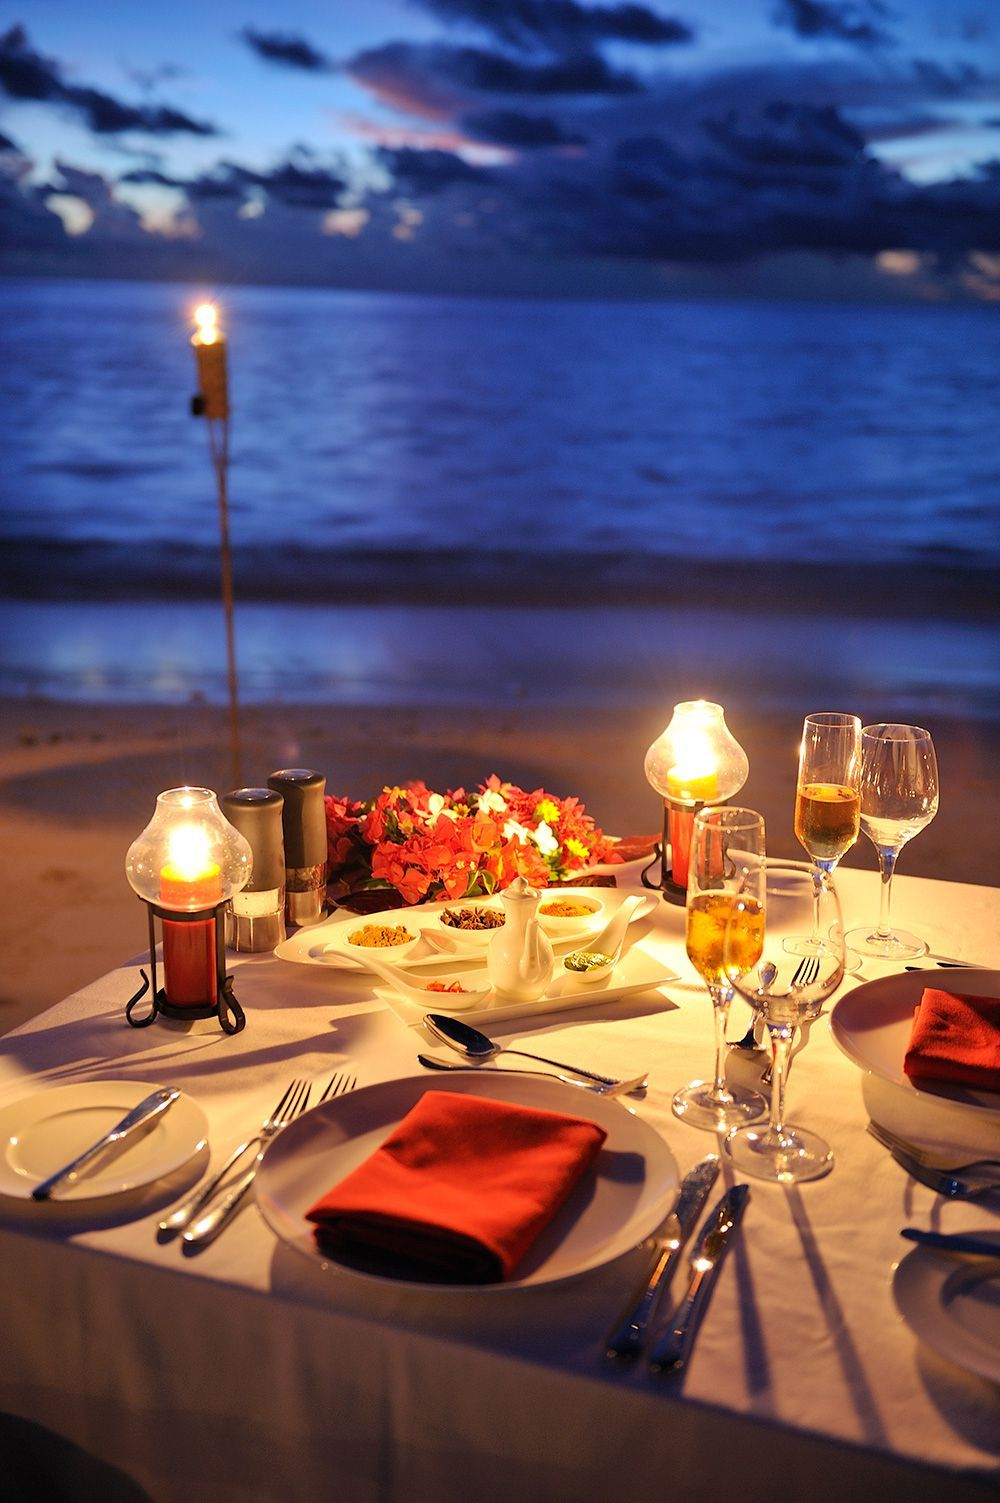 The Gangleader S Girl Romantic Table Dining Table Decor Romantic Dinners